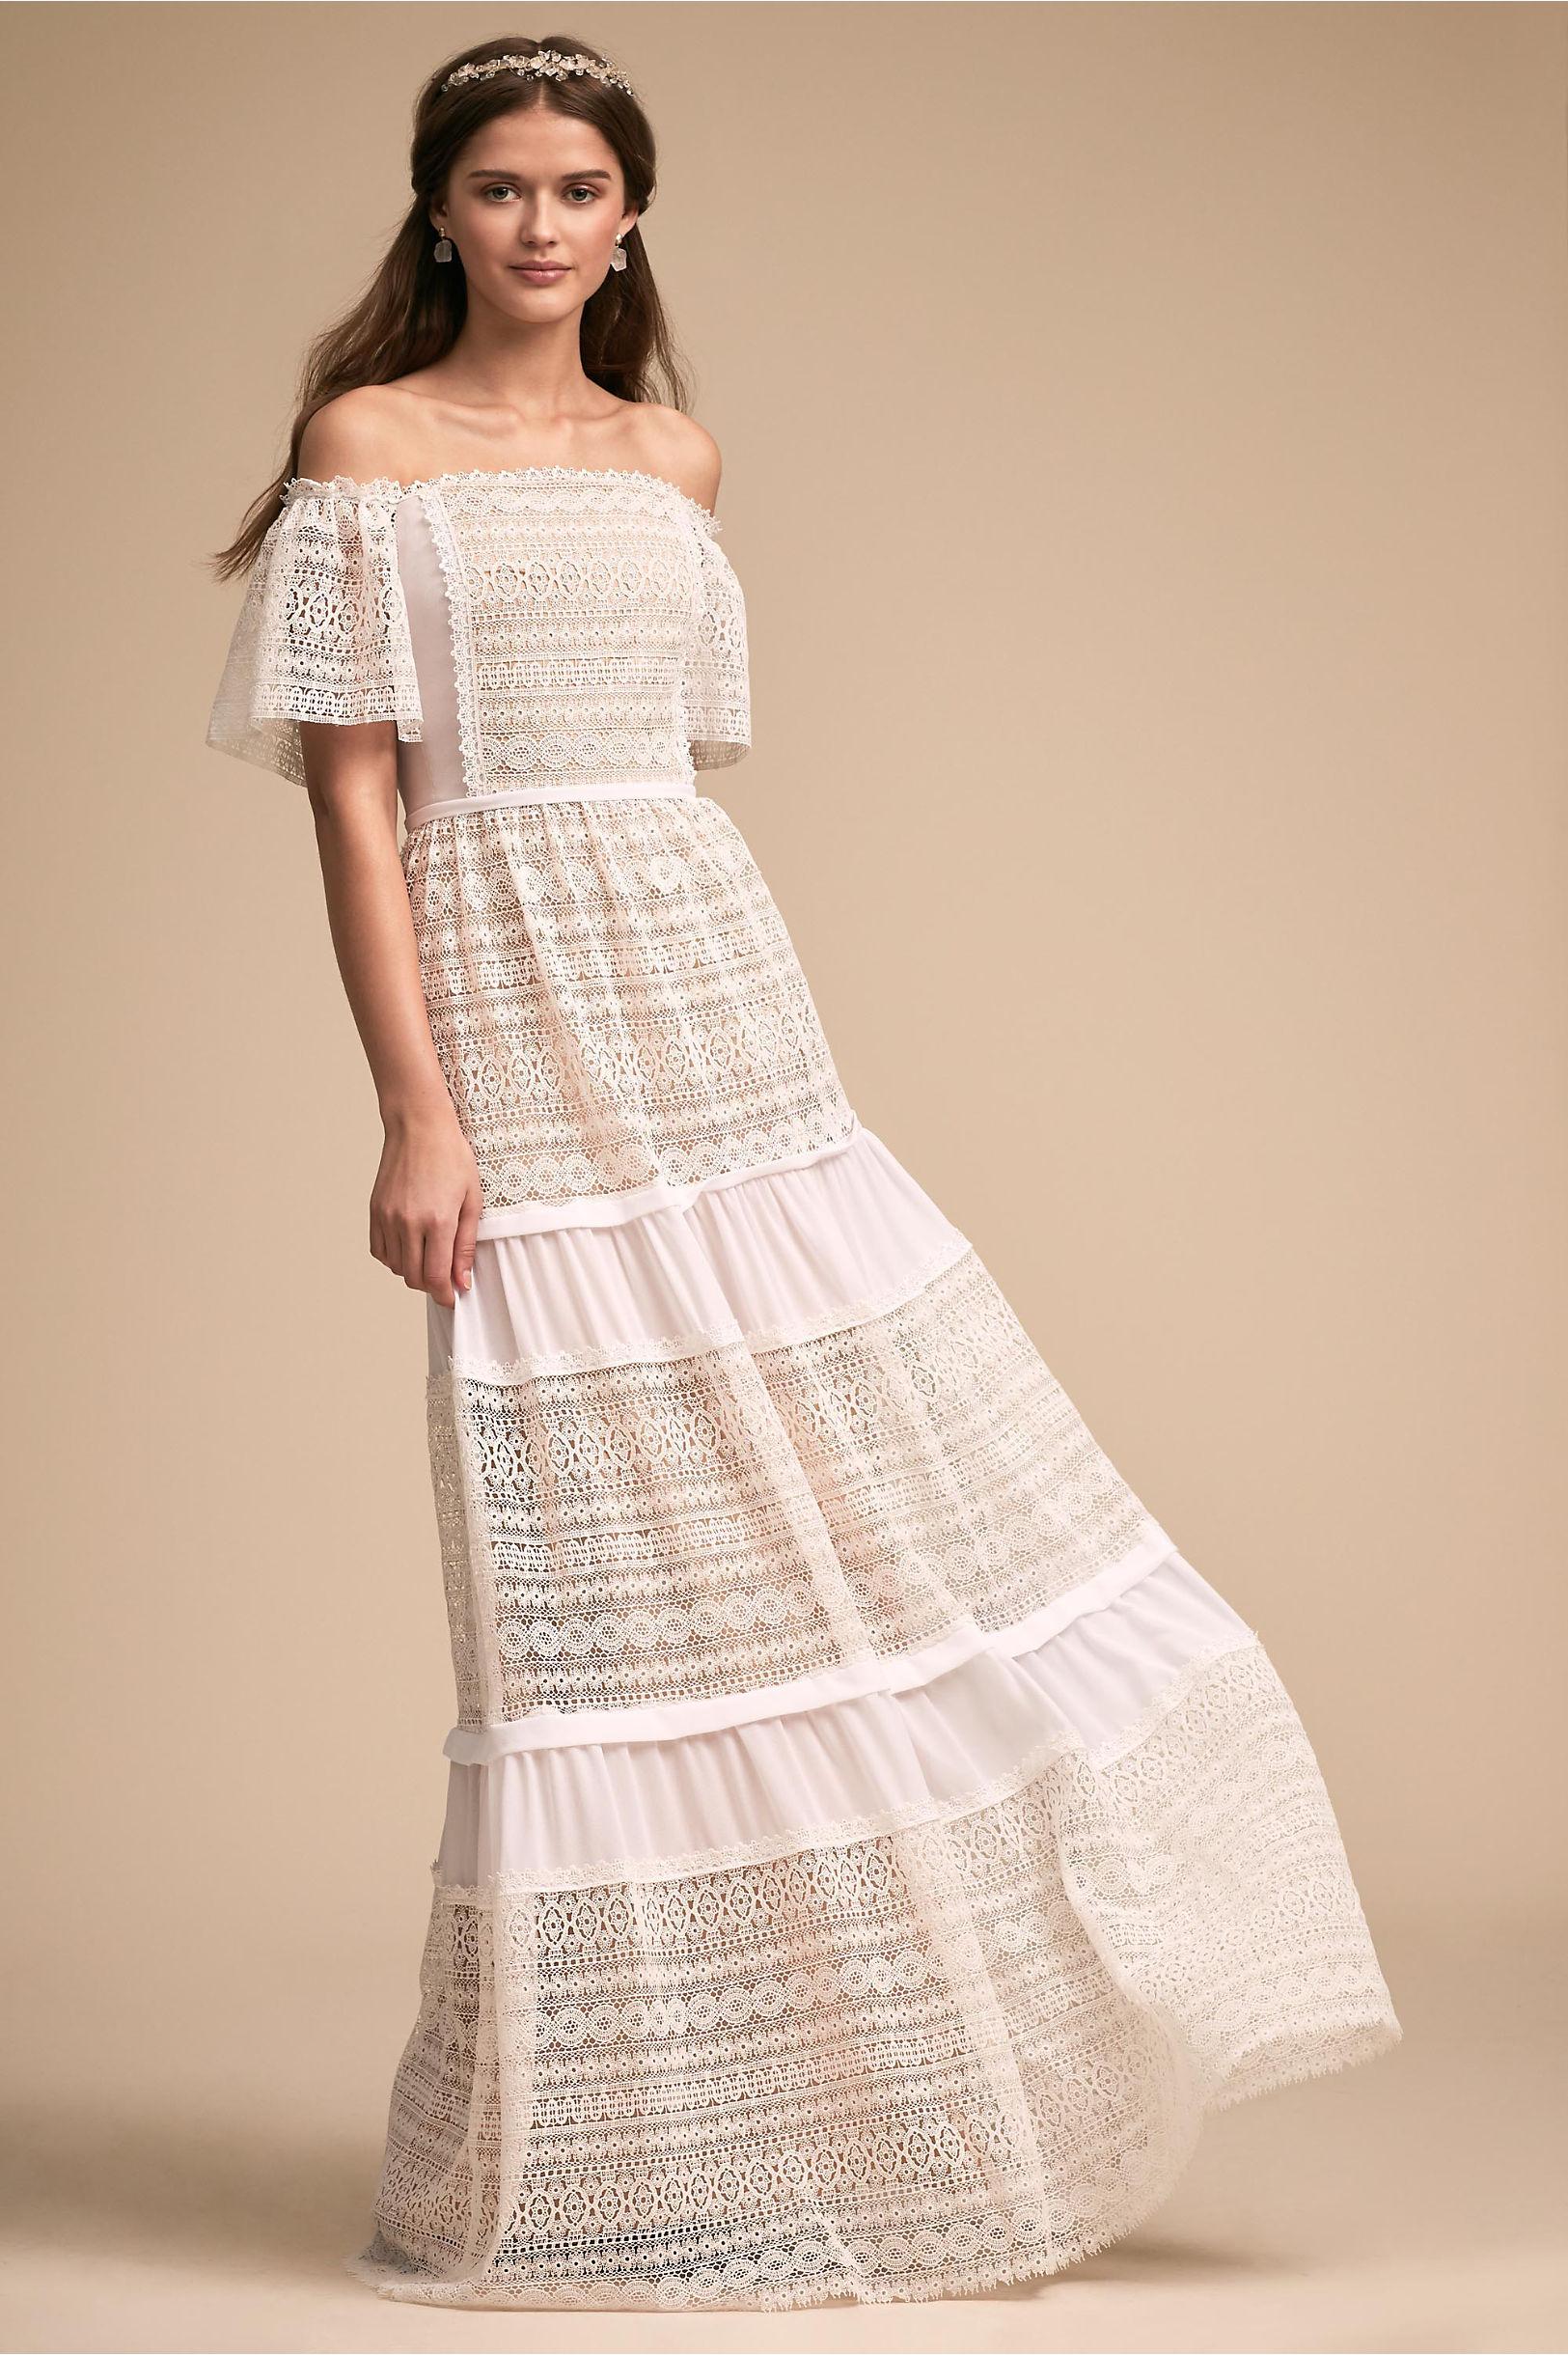 Shiloh Dress Ivory in Sale | BHLDN